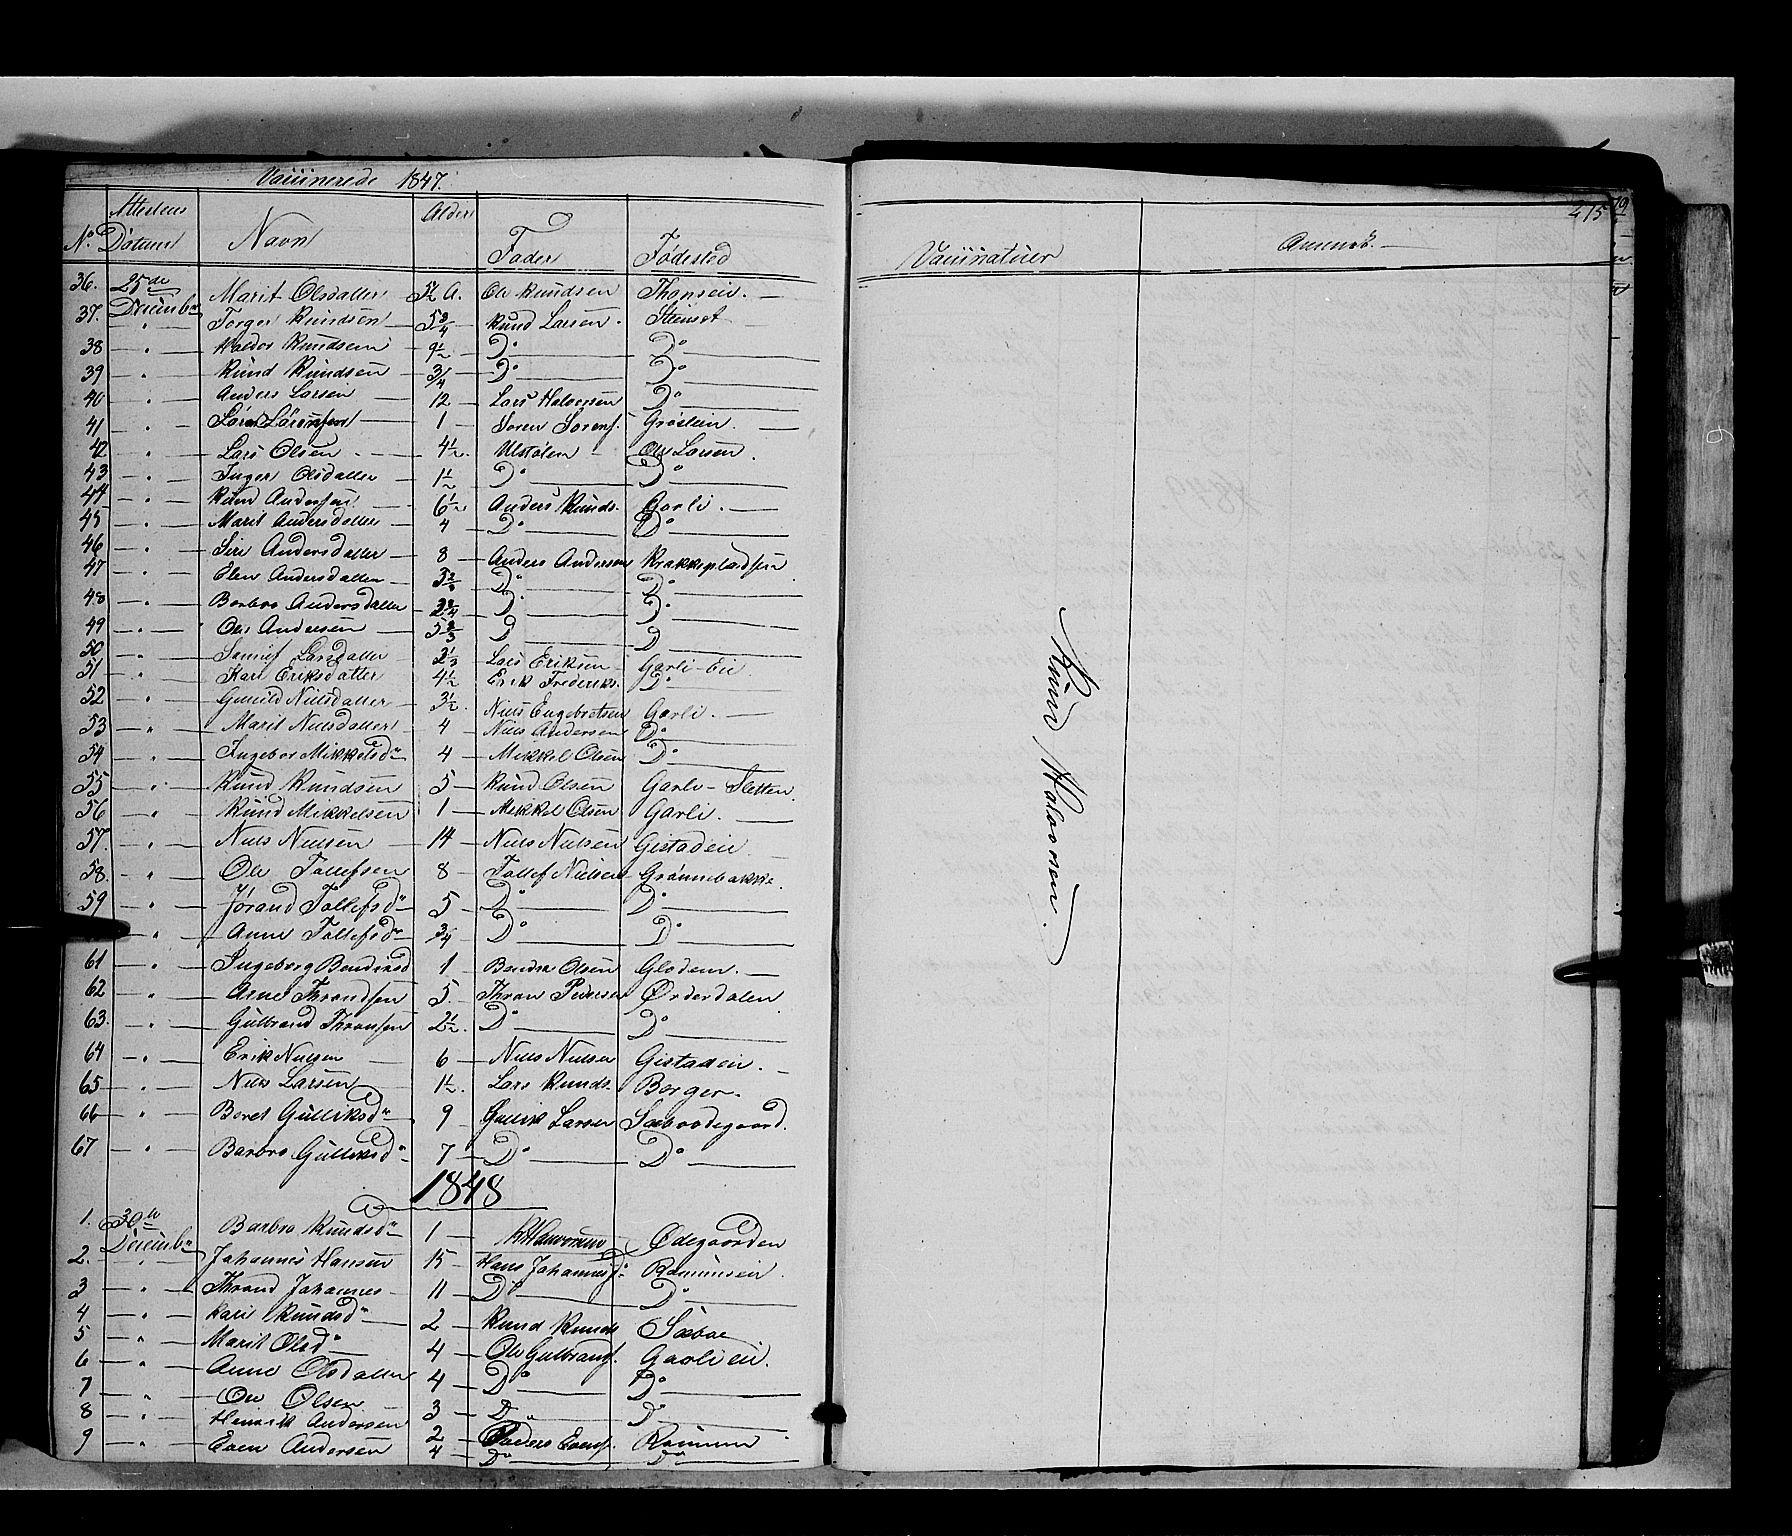 SAH, Nord-Aurdal prestekontor, Ministerialbok nr. 7, 1842-1863, s. 275